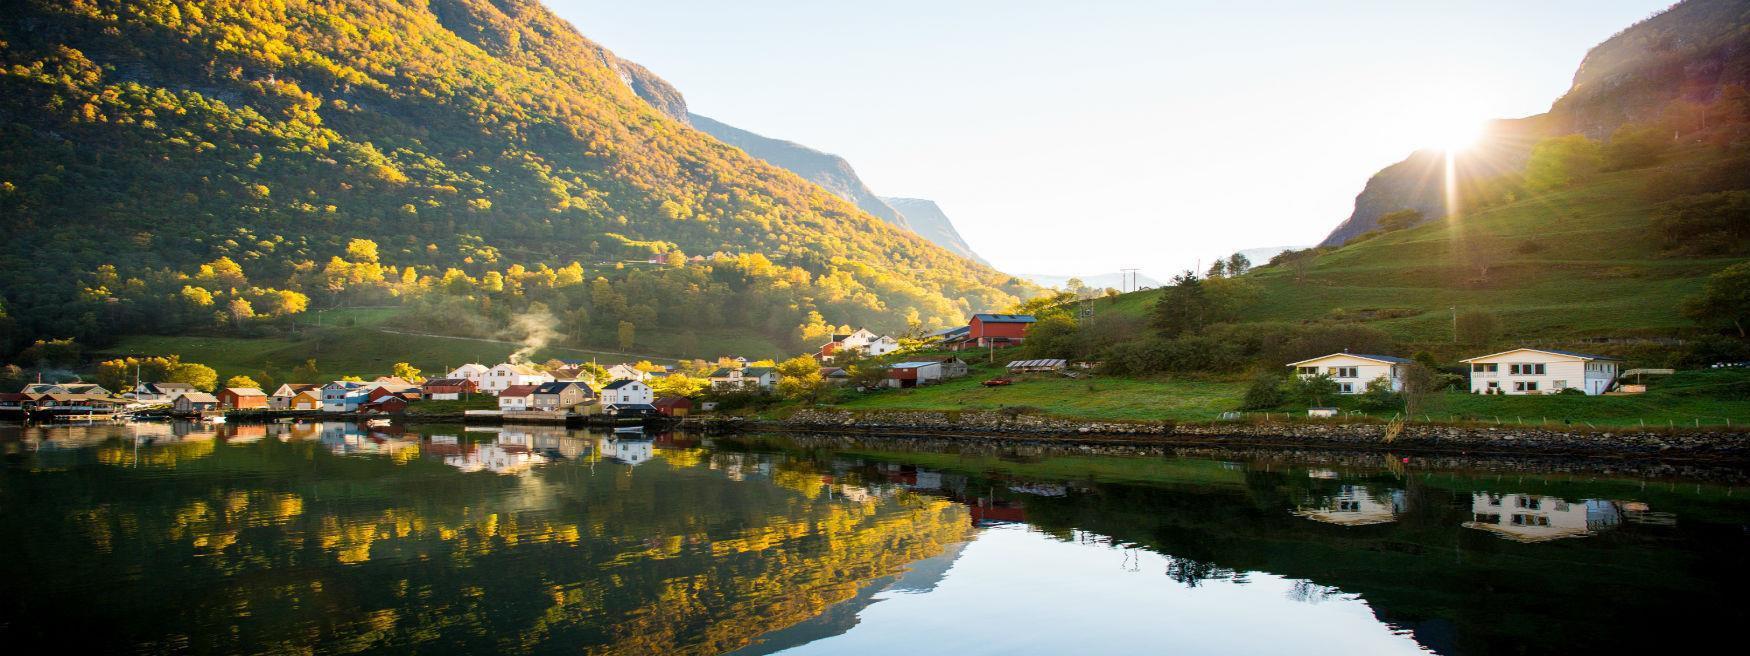 Fjordcruise © SverreHjornevik Flam AS